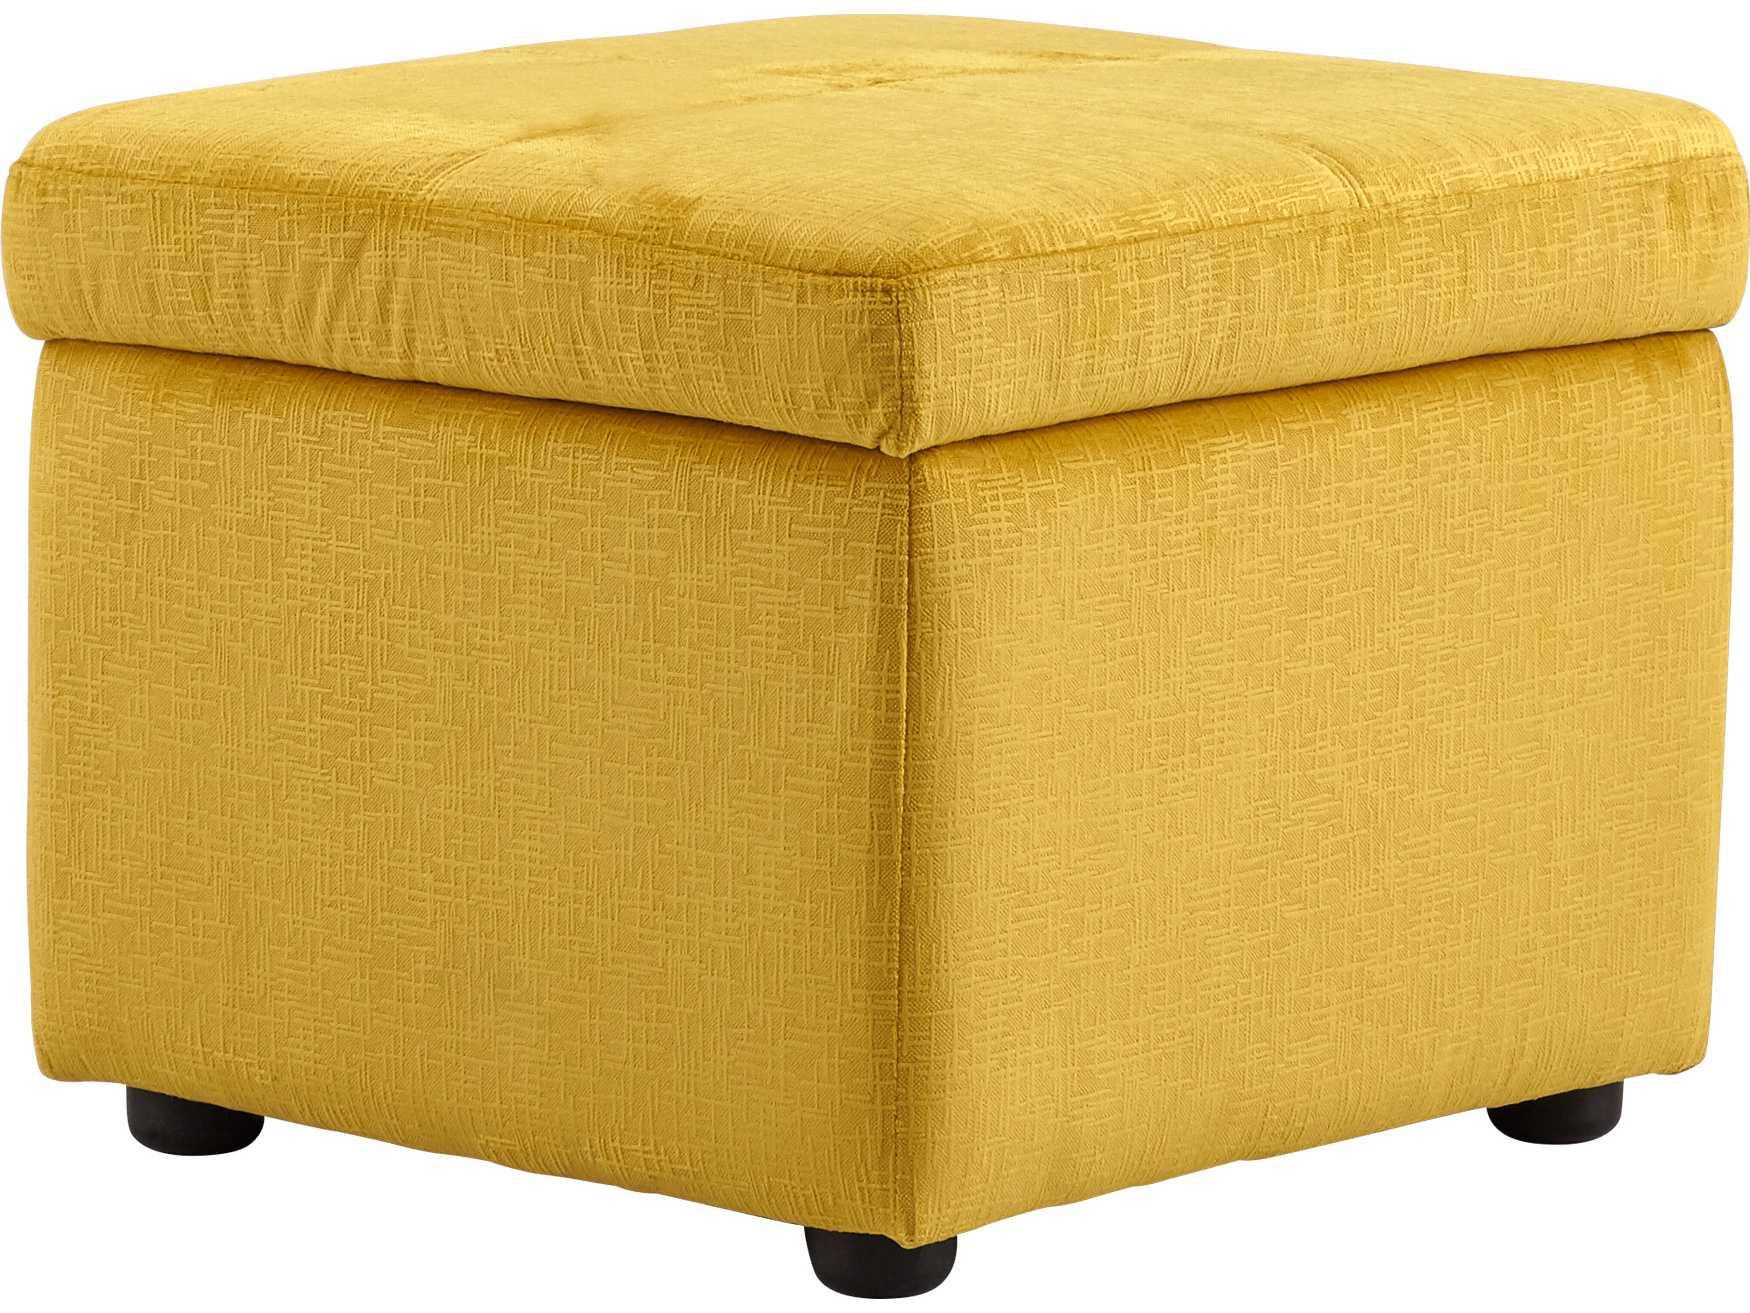 Cyan Design Hiffington Yellow Ottoman C308347